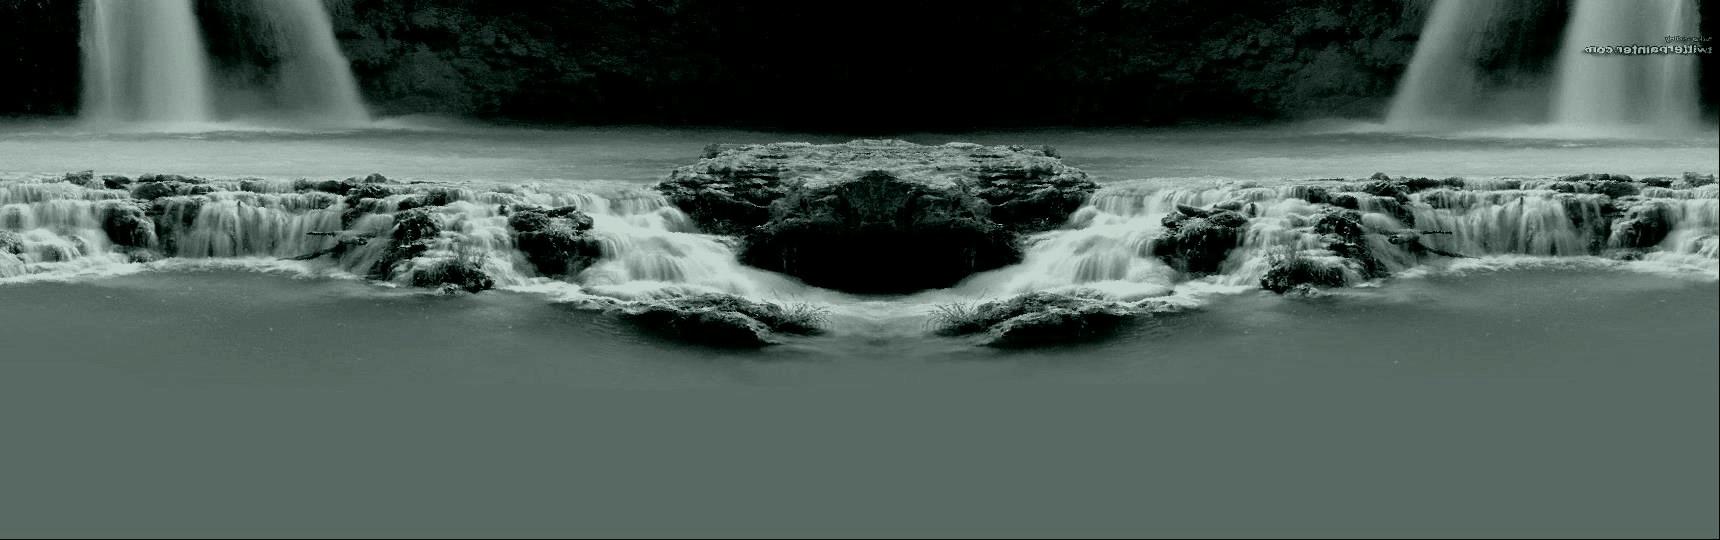 havasu-falls.jpg